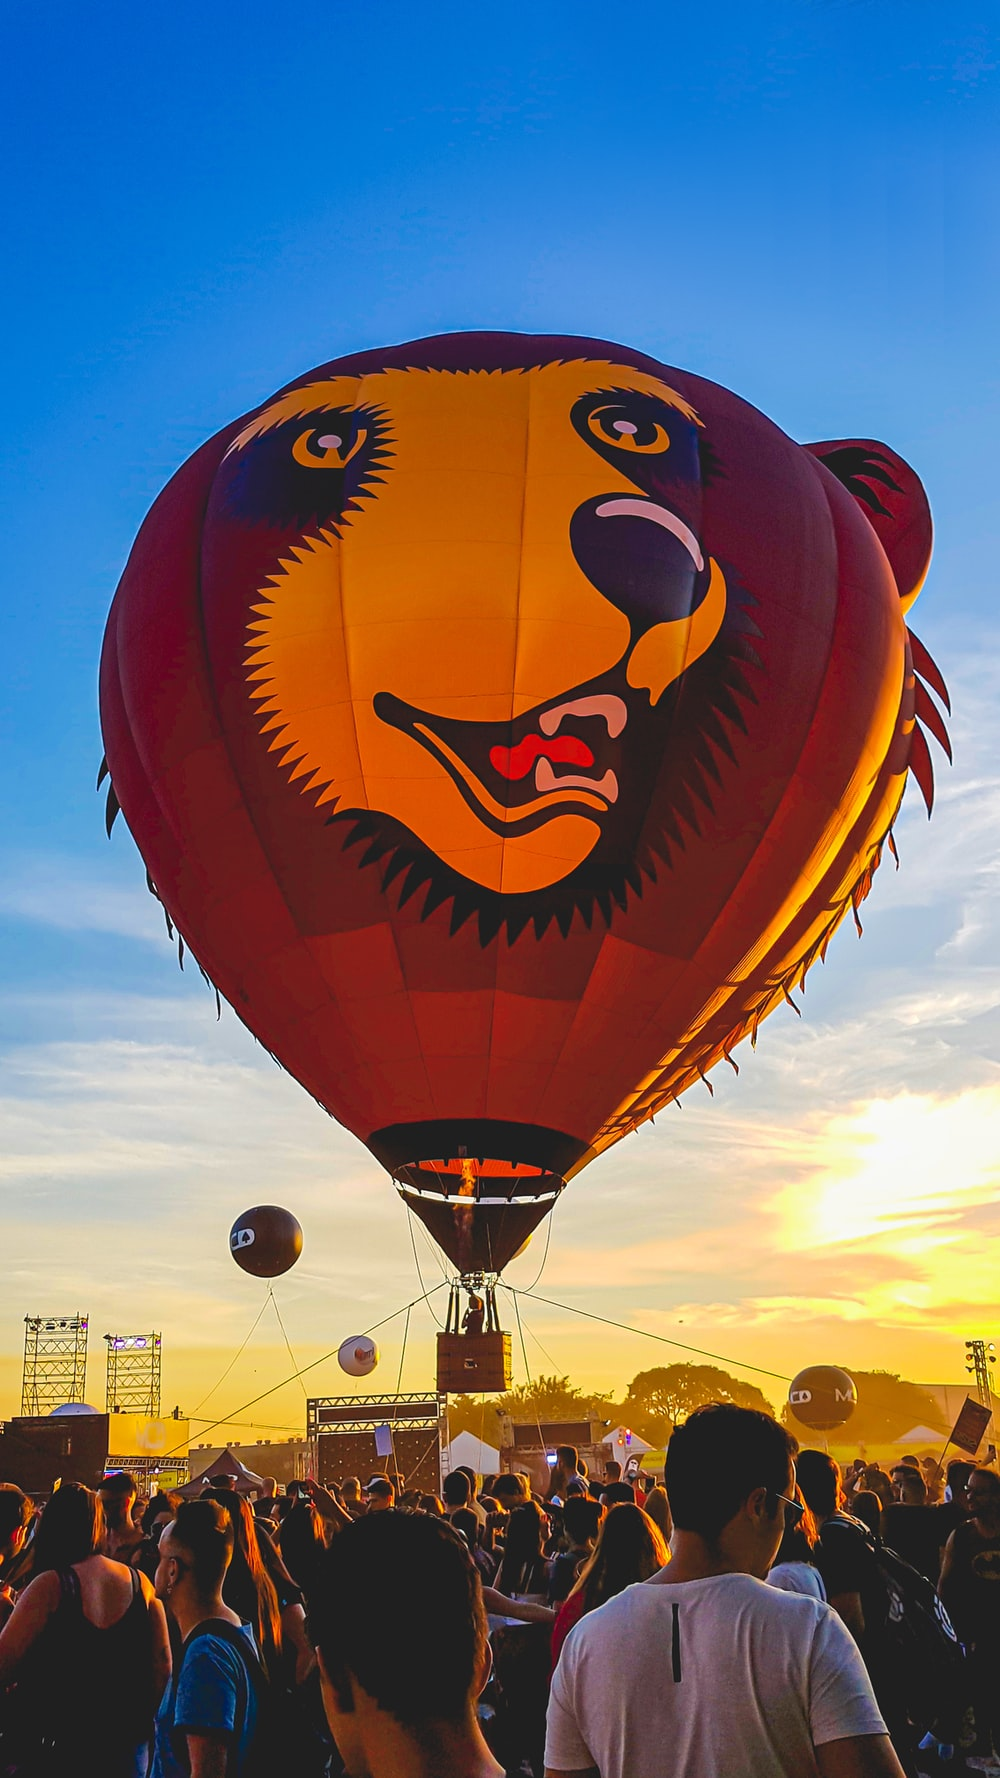 brown hot-air balloon under blue sky